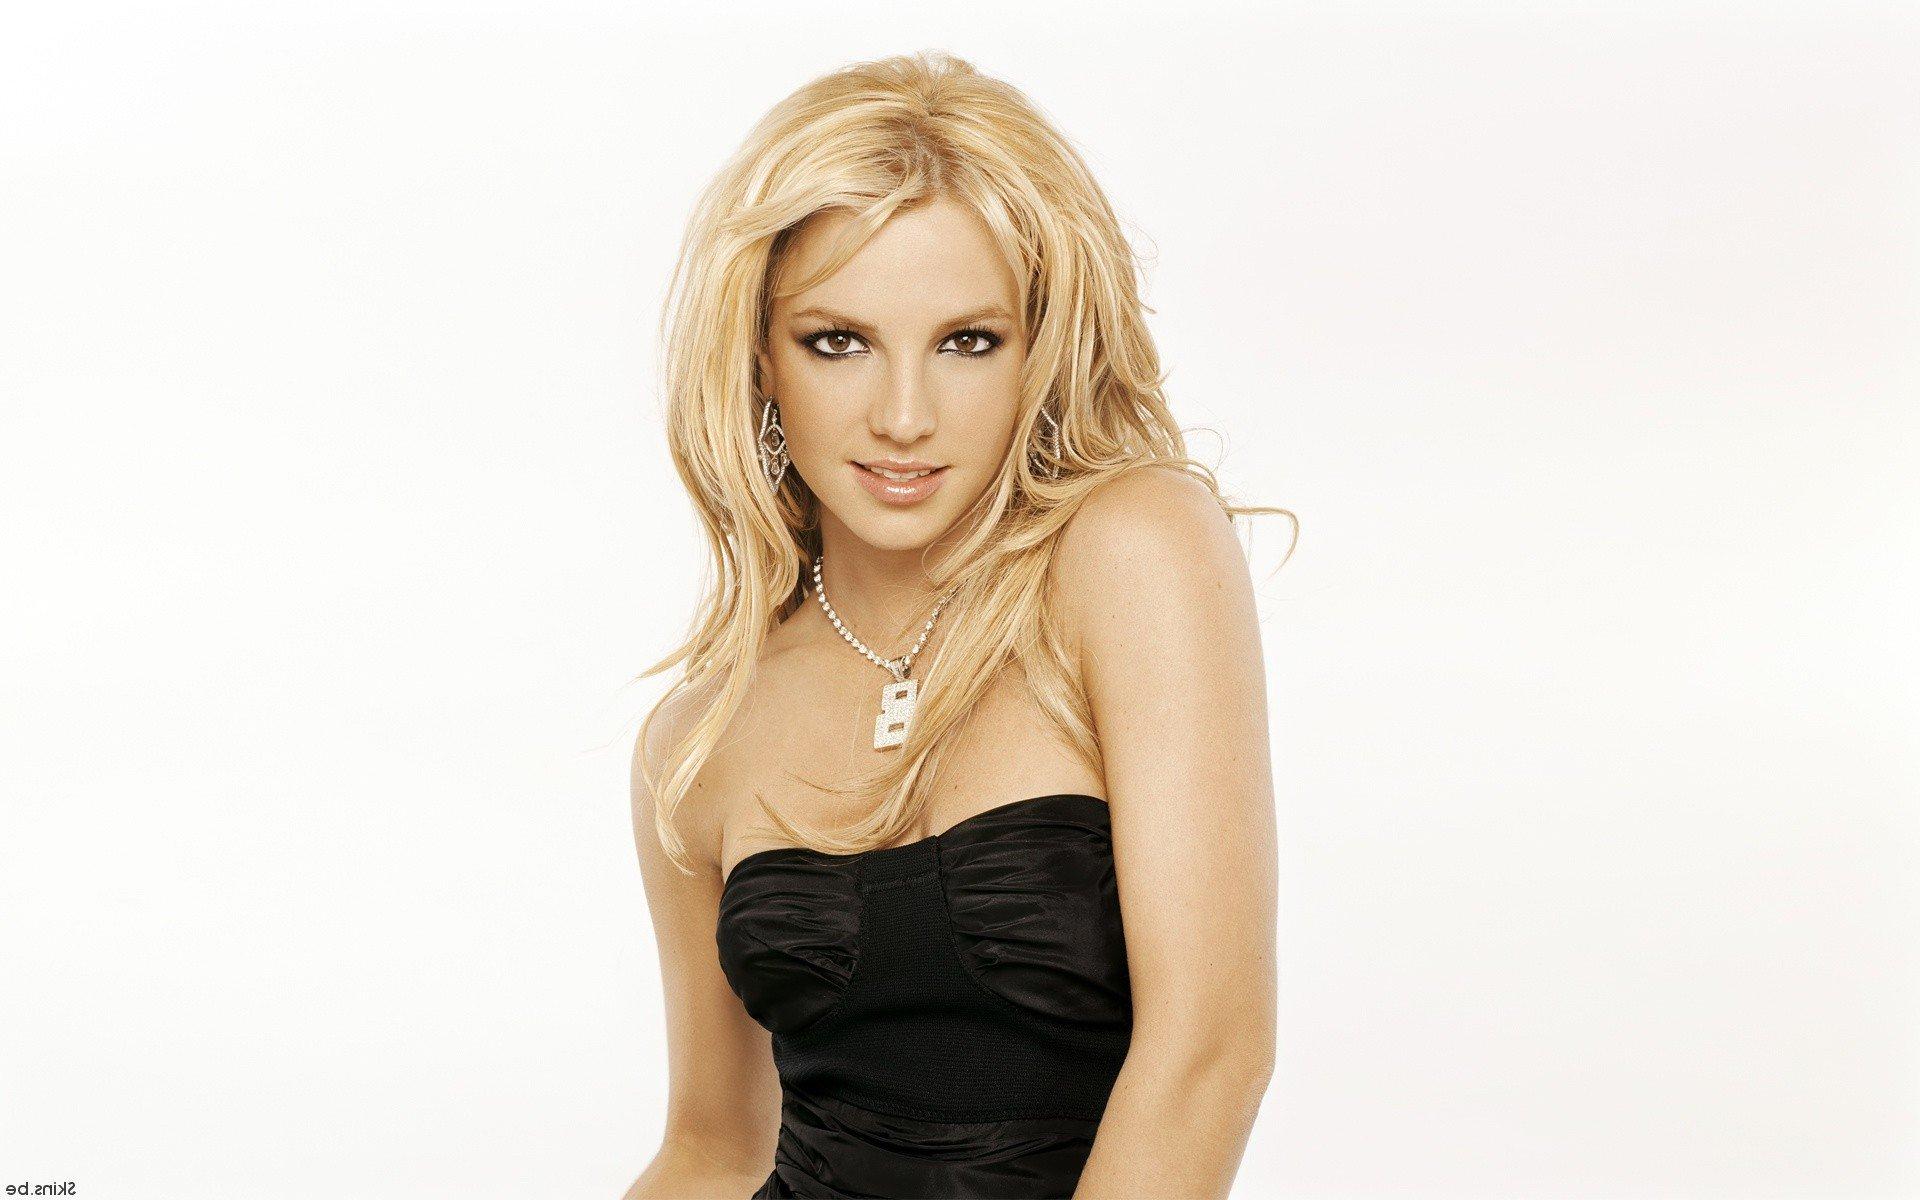 Britney Spears 1366x768 Resolution